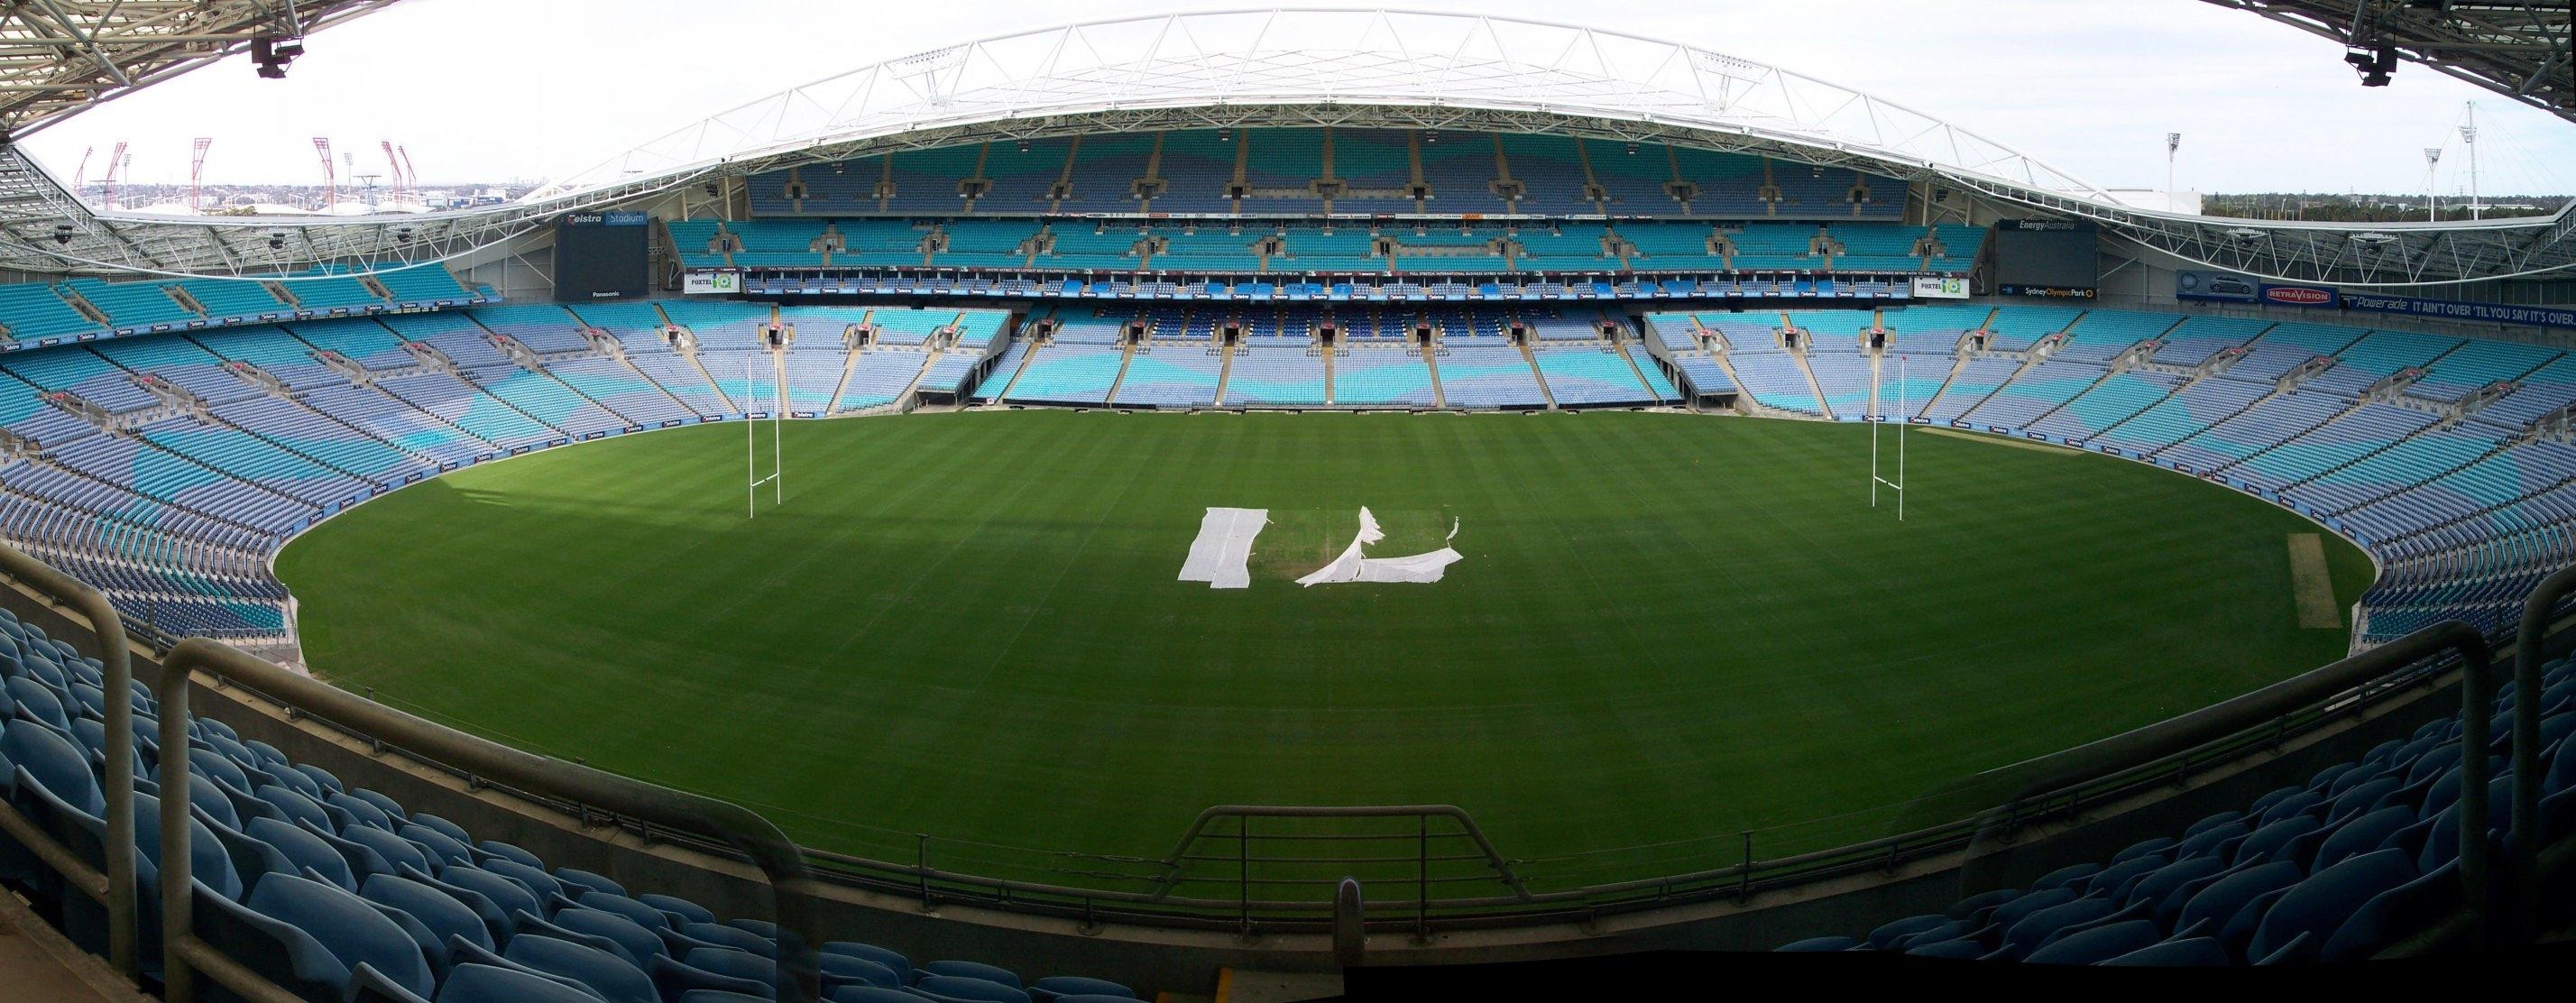 The Telstra Stadium in Sydney, Australia where England won the RWC